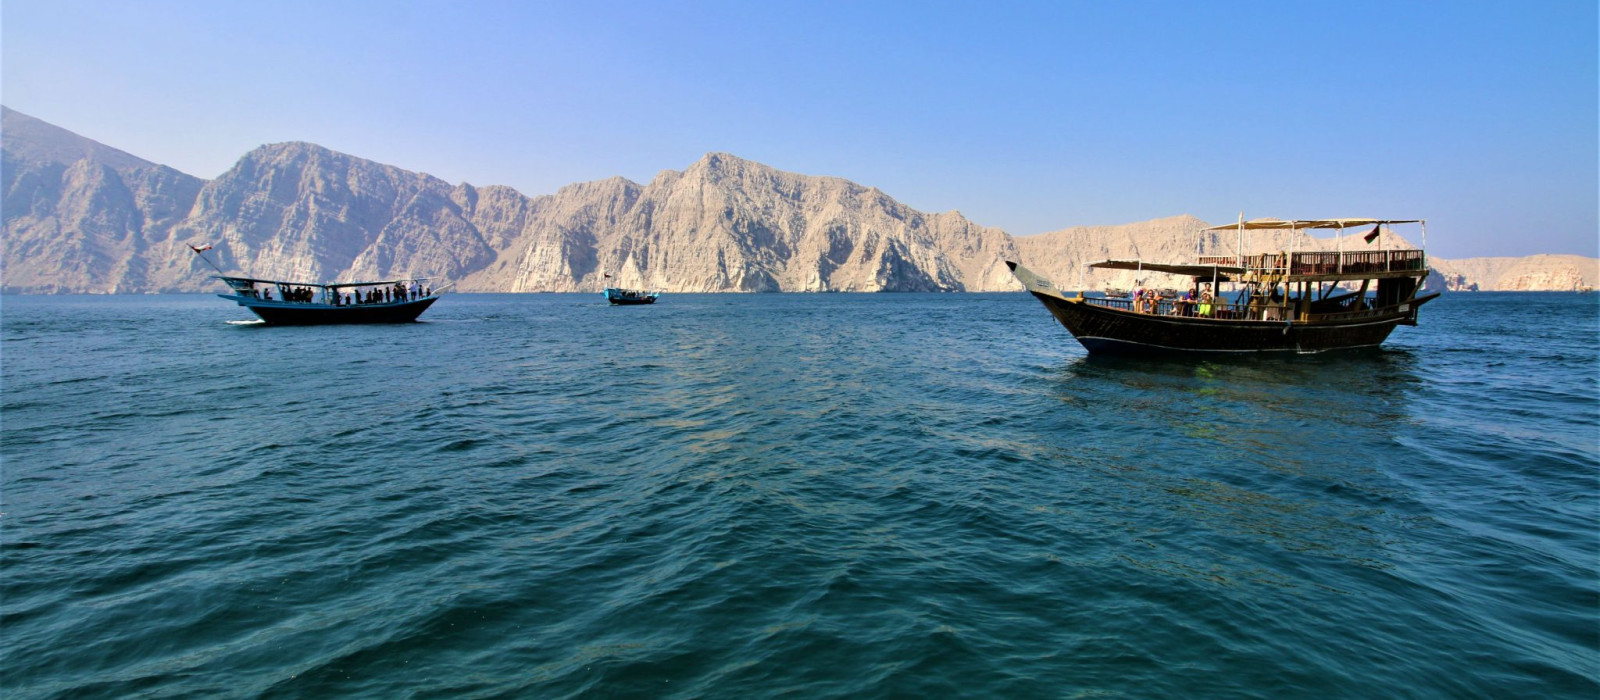 Destination Khasab & Musandam Region Oman